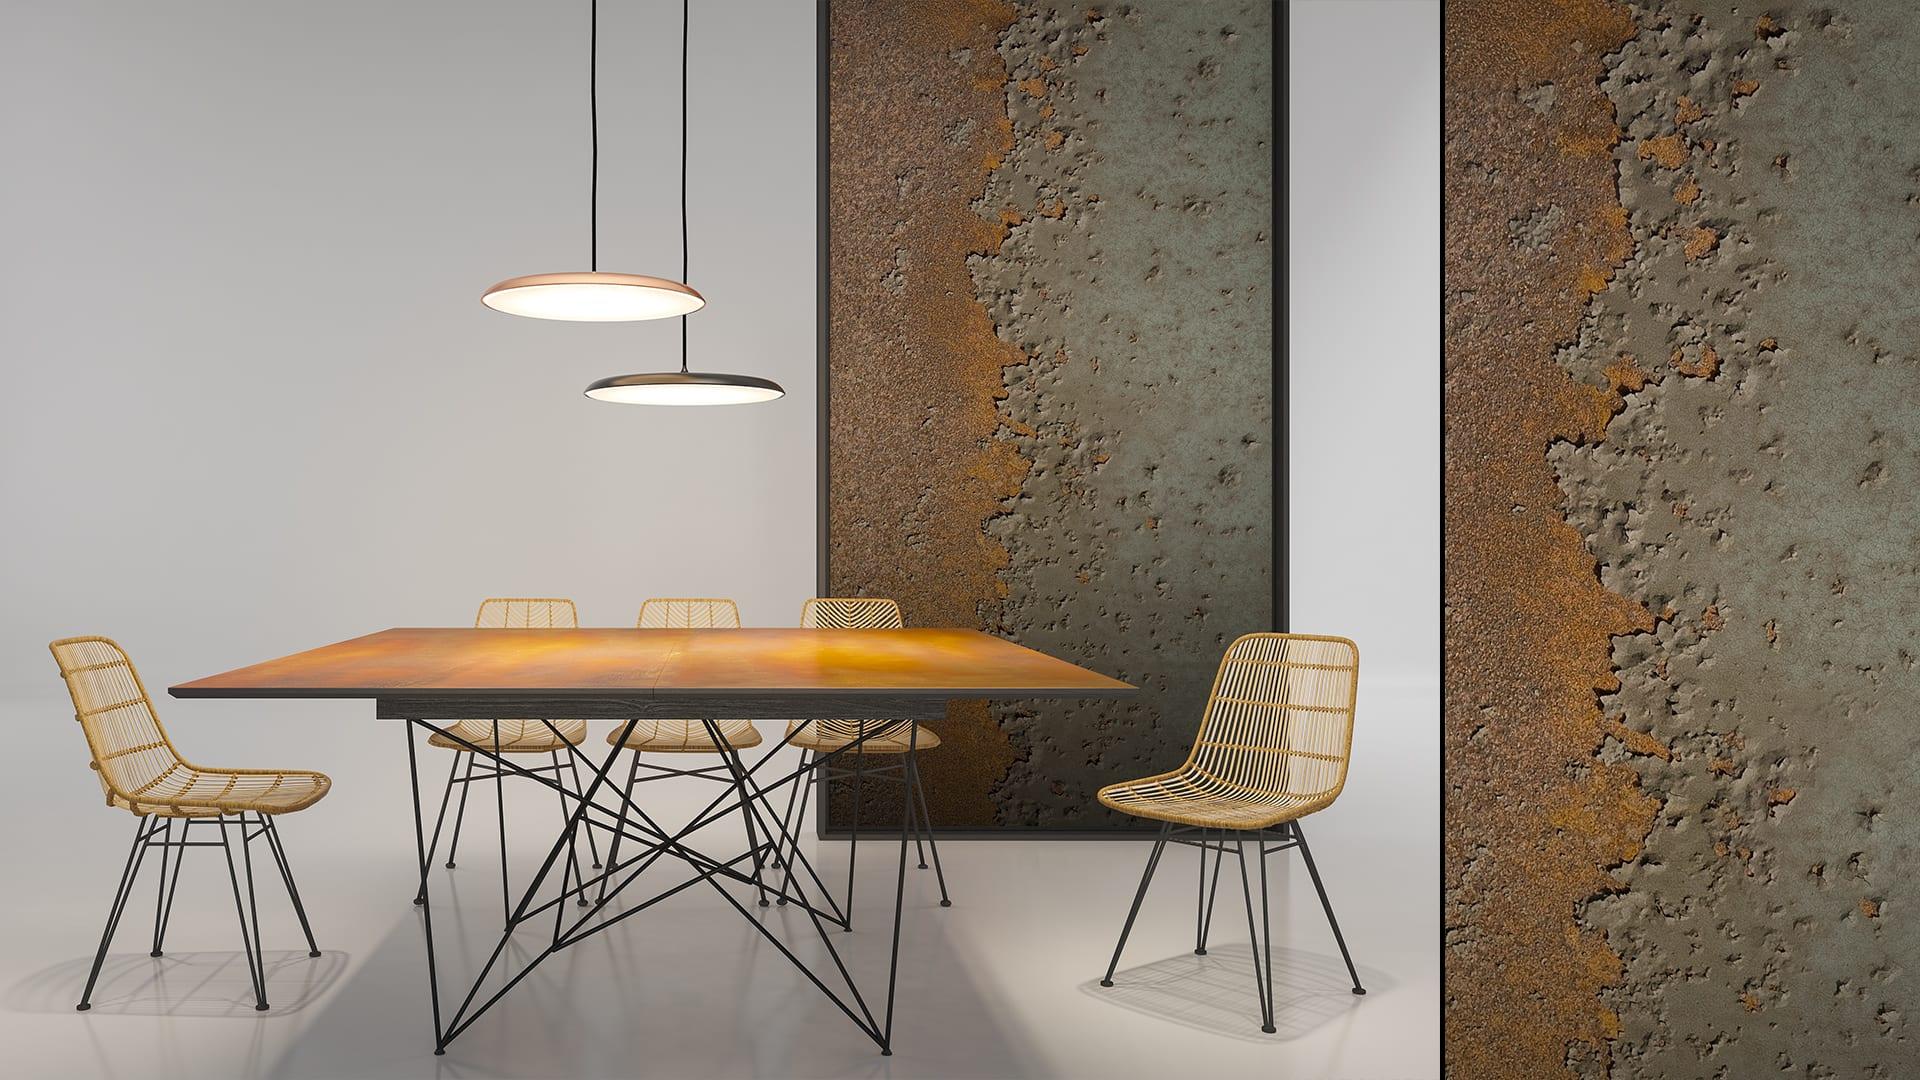 Maayan-Golan_Architectural-Visualization_3d-product-visualization_zaga-dining_02